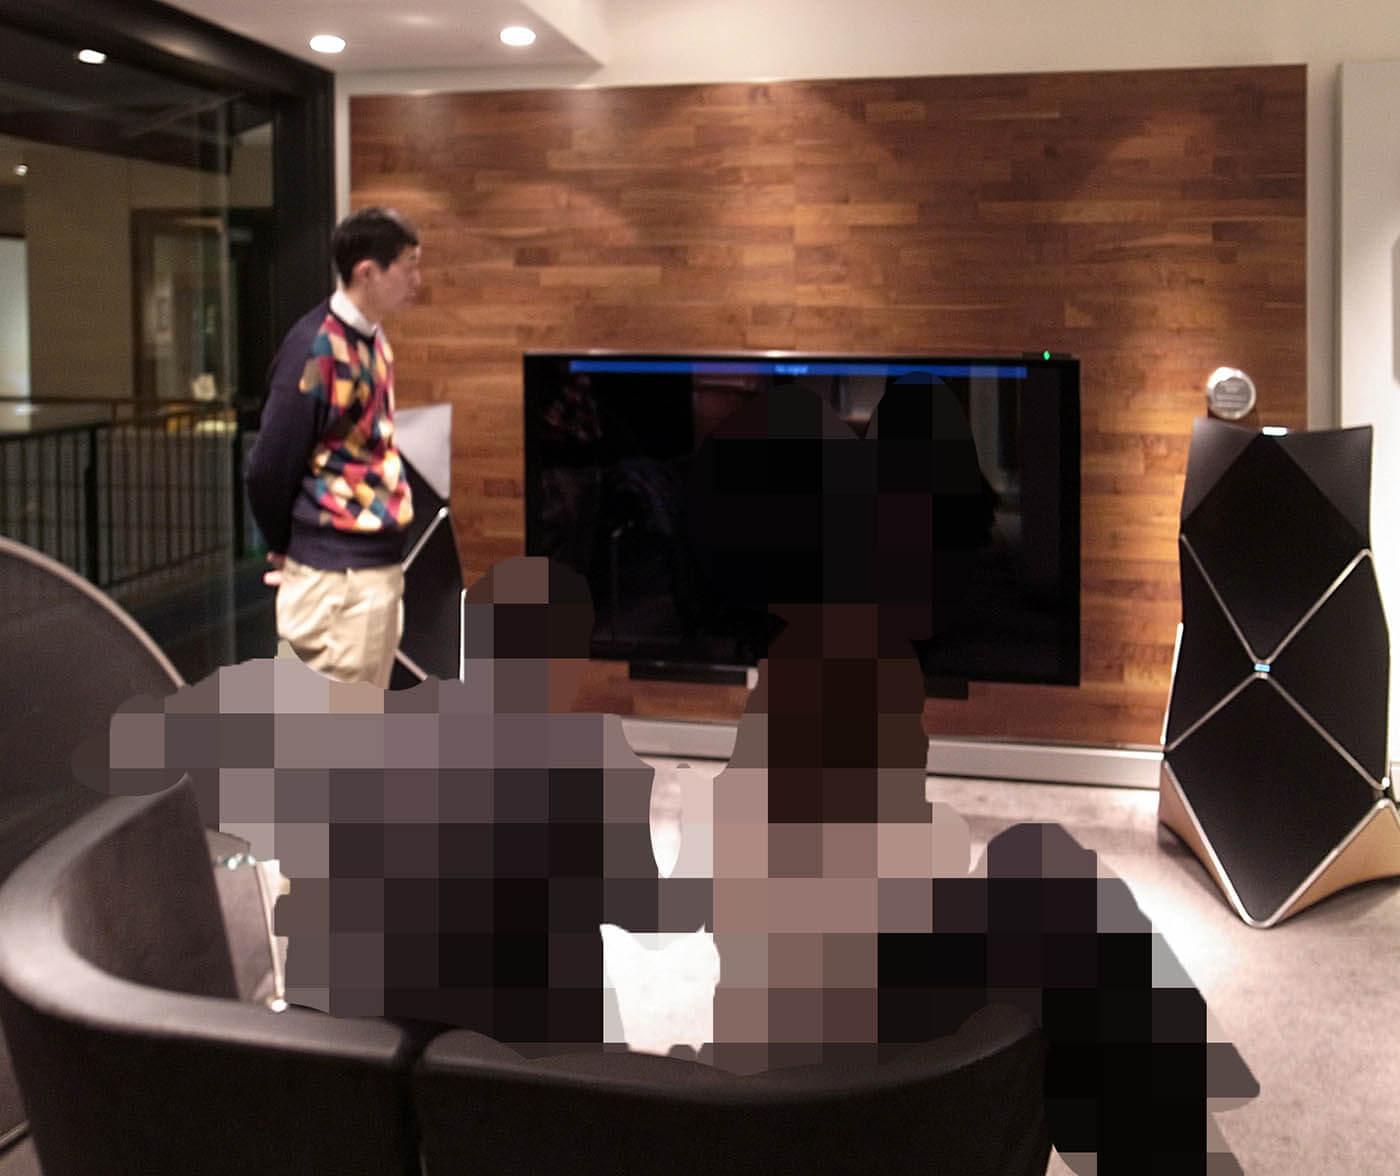 B&O六本木ショールームでのシアタールーム体験